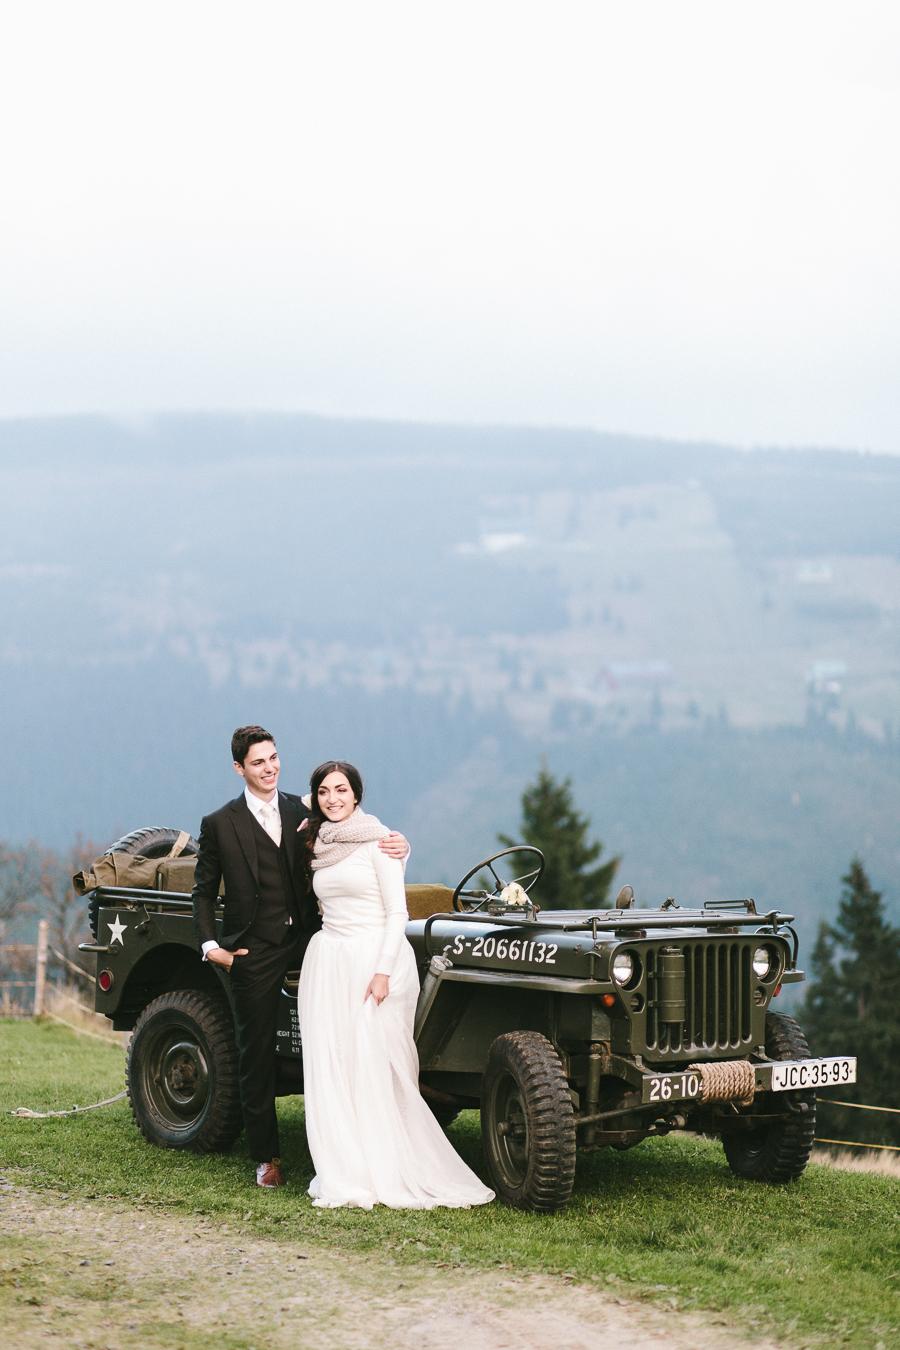 149-everbay-wedding-photography-IMG_0064.jpg